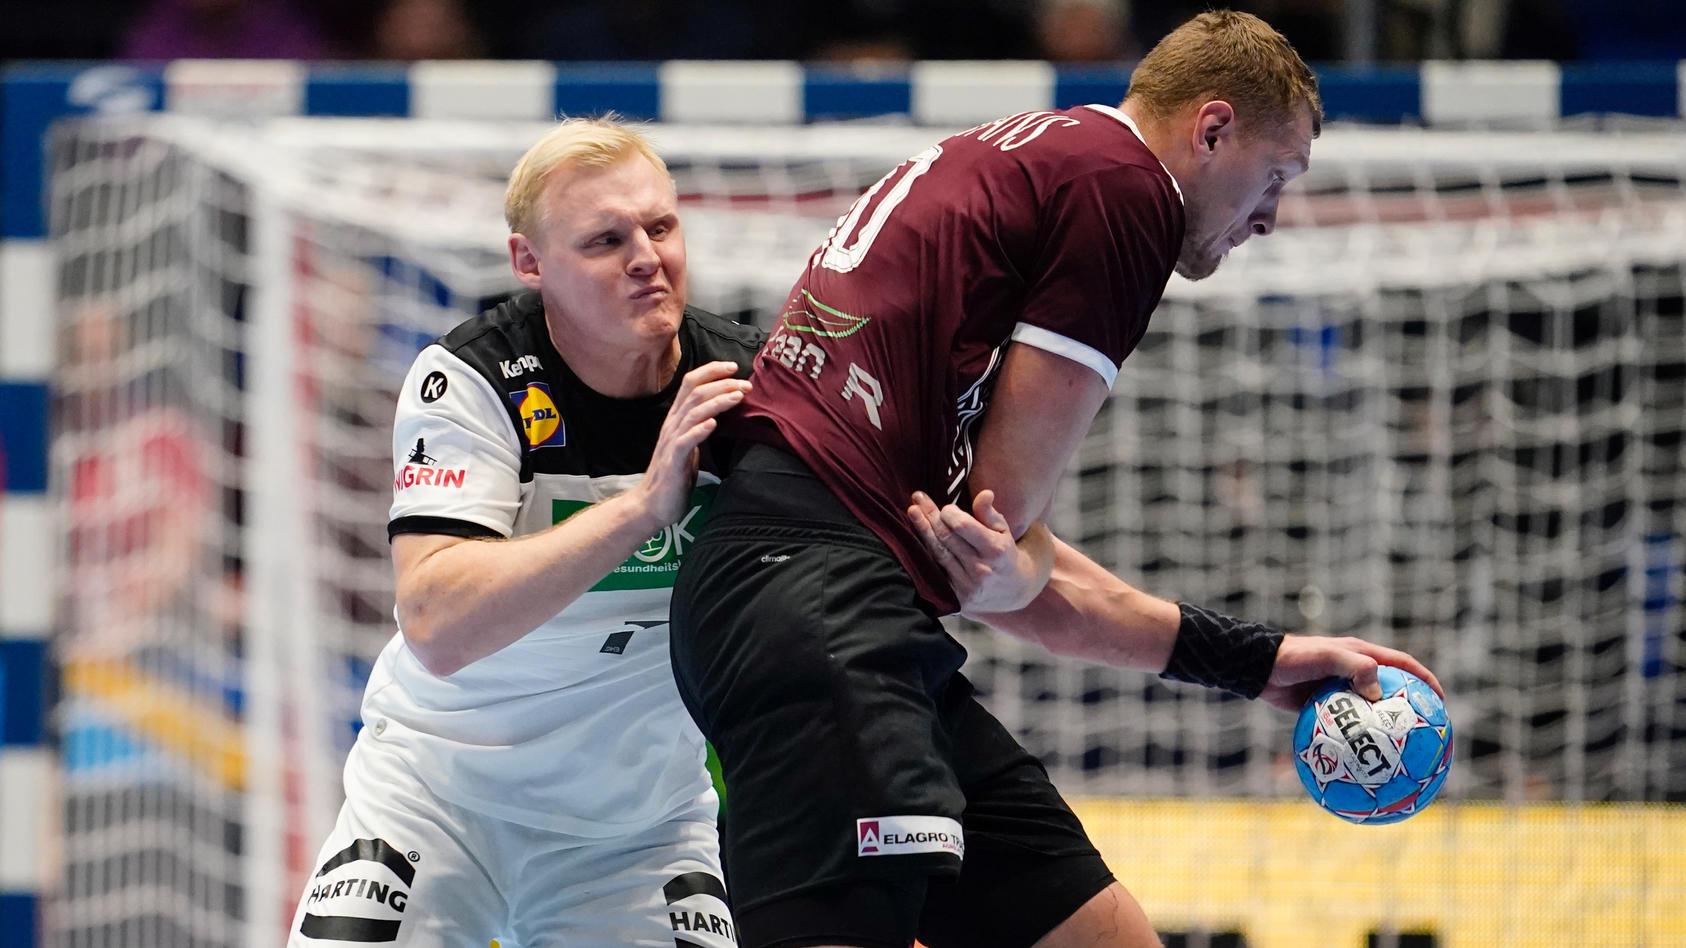 2020 EHF European Men's Handball Championship - Latvia v Germany